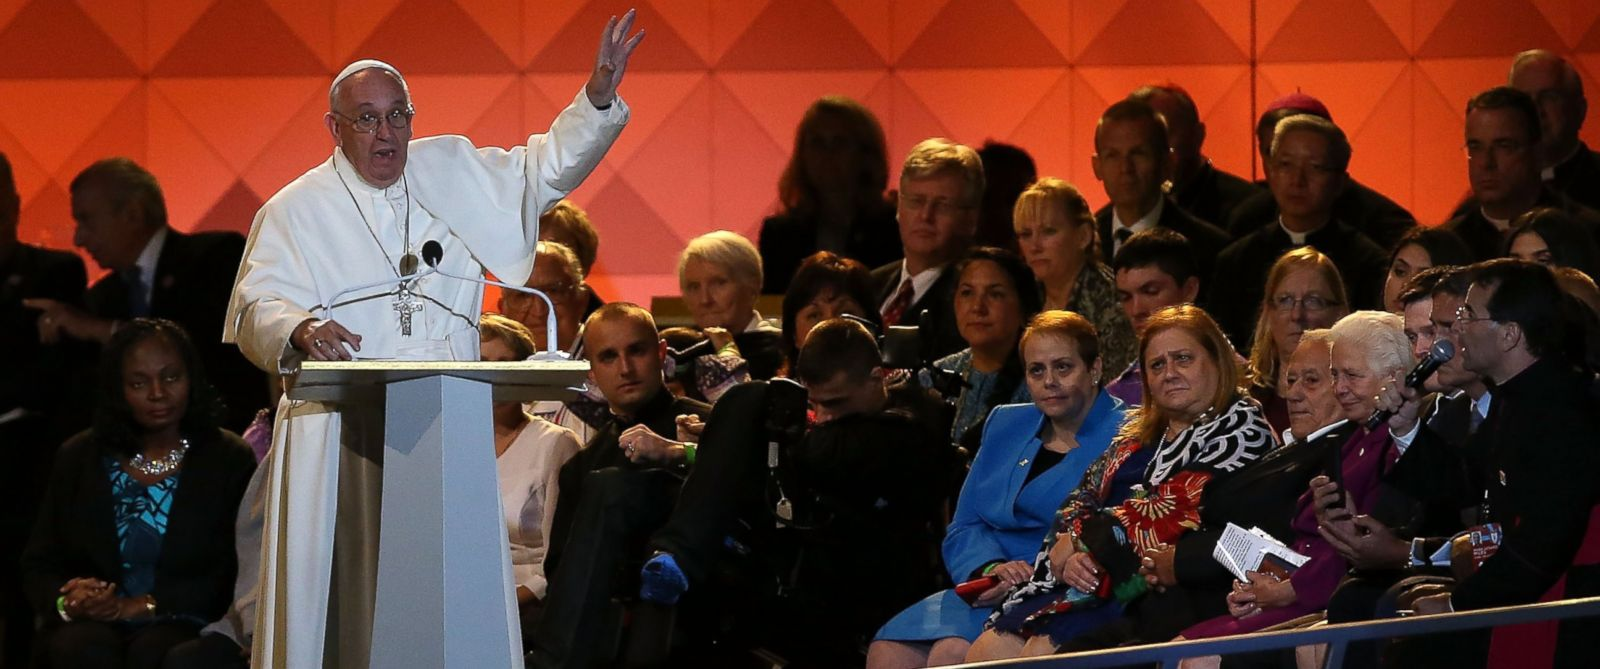 PHOTO: Pope Francis speaks during the Festival of Families on Sept. 26, 2015 in Philadelphia.